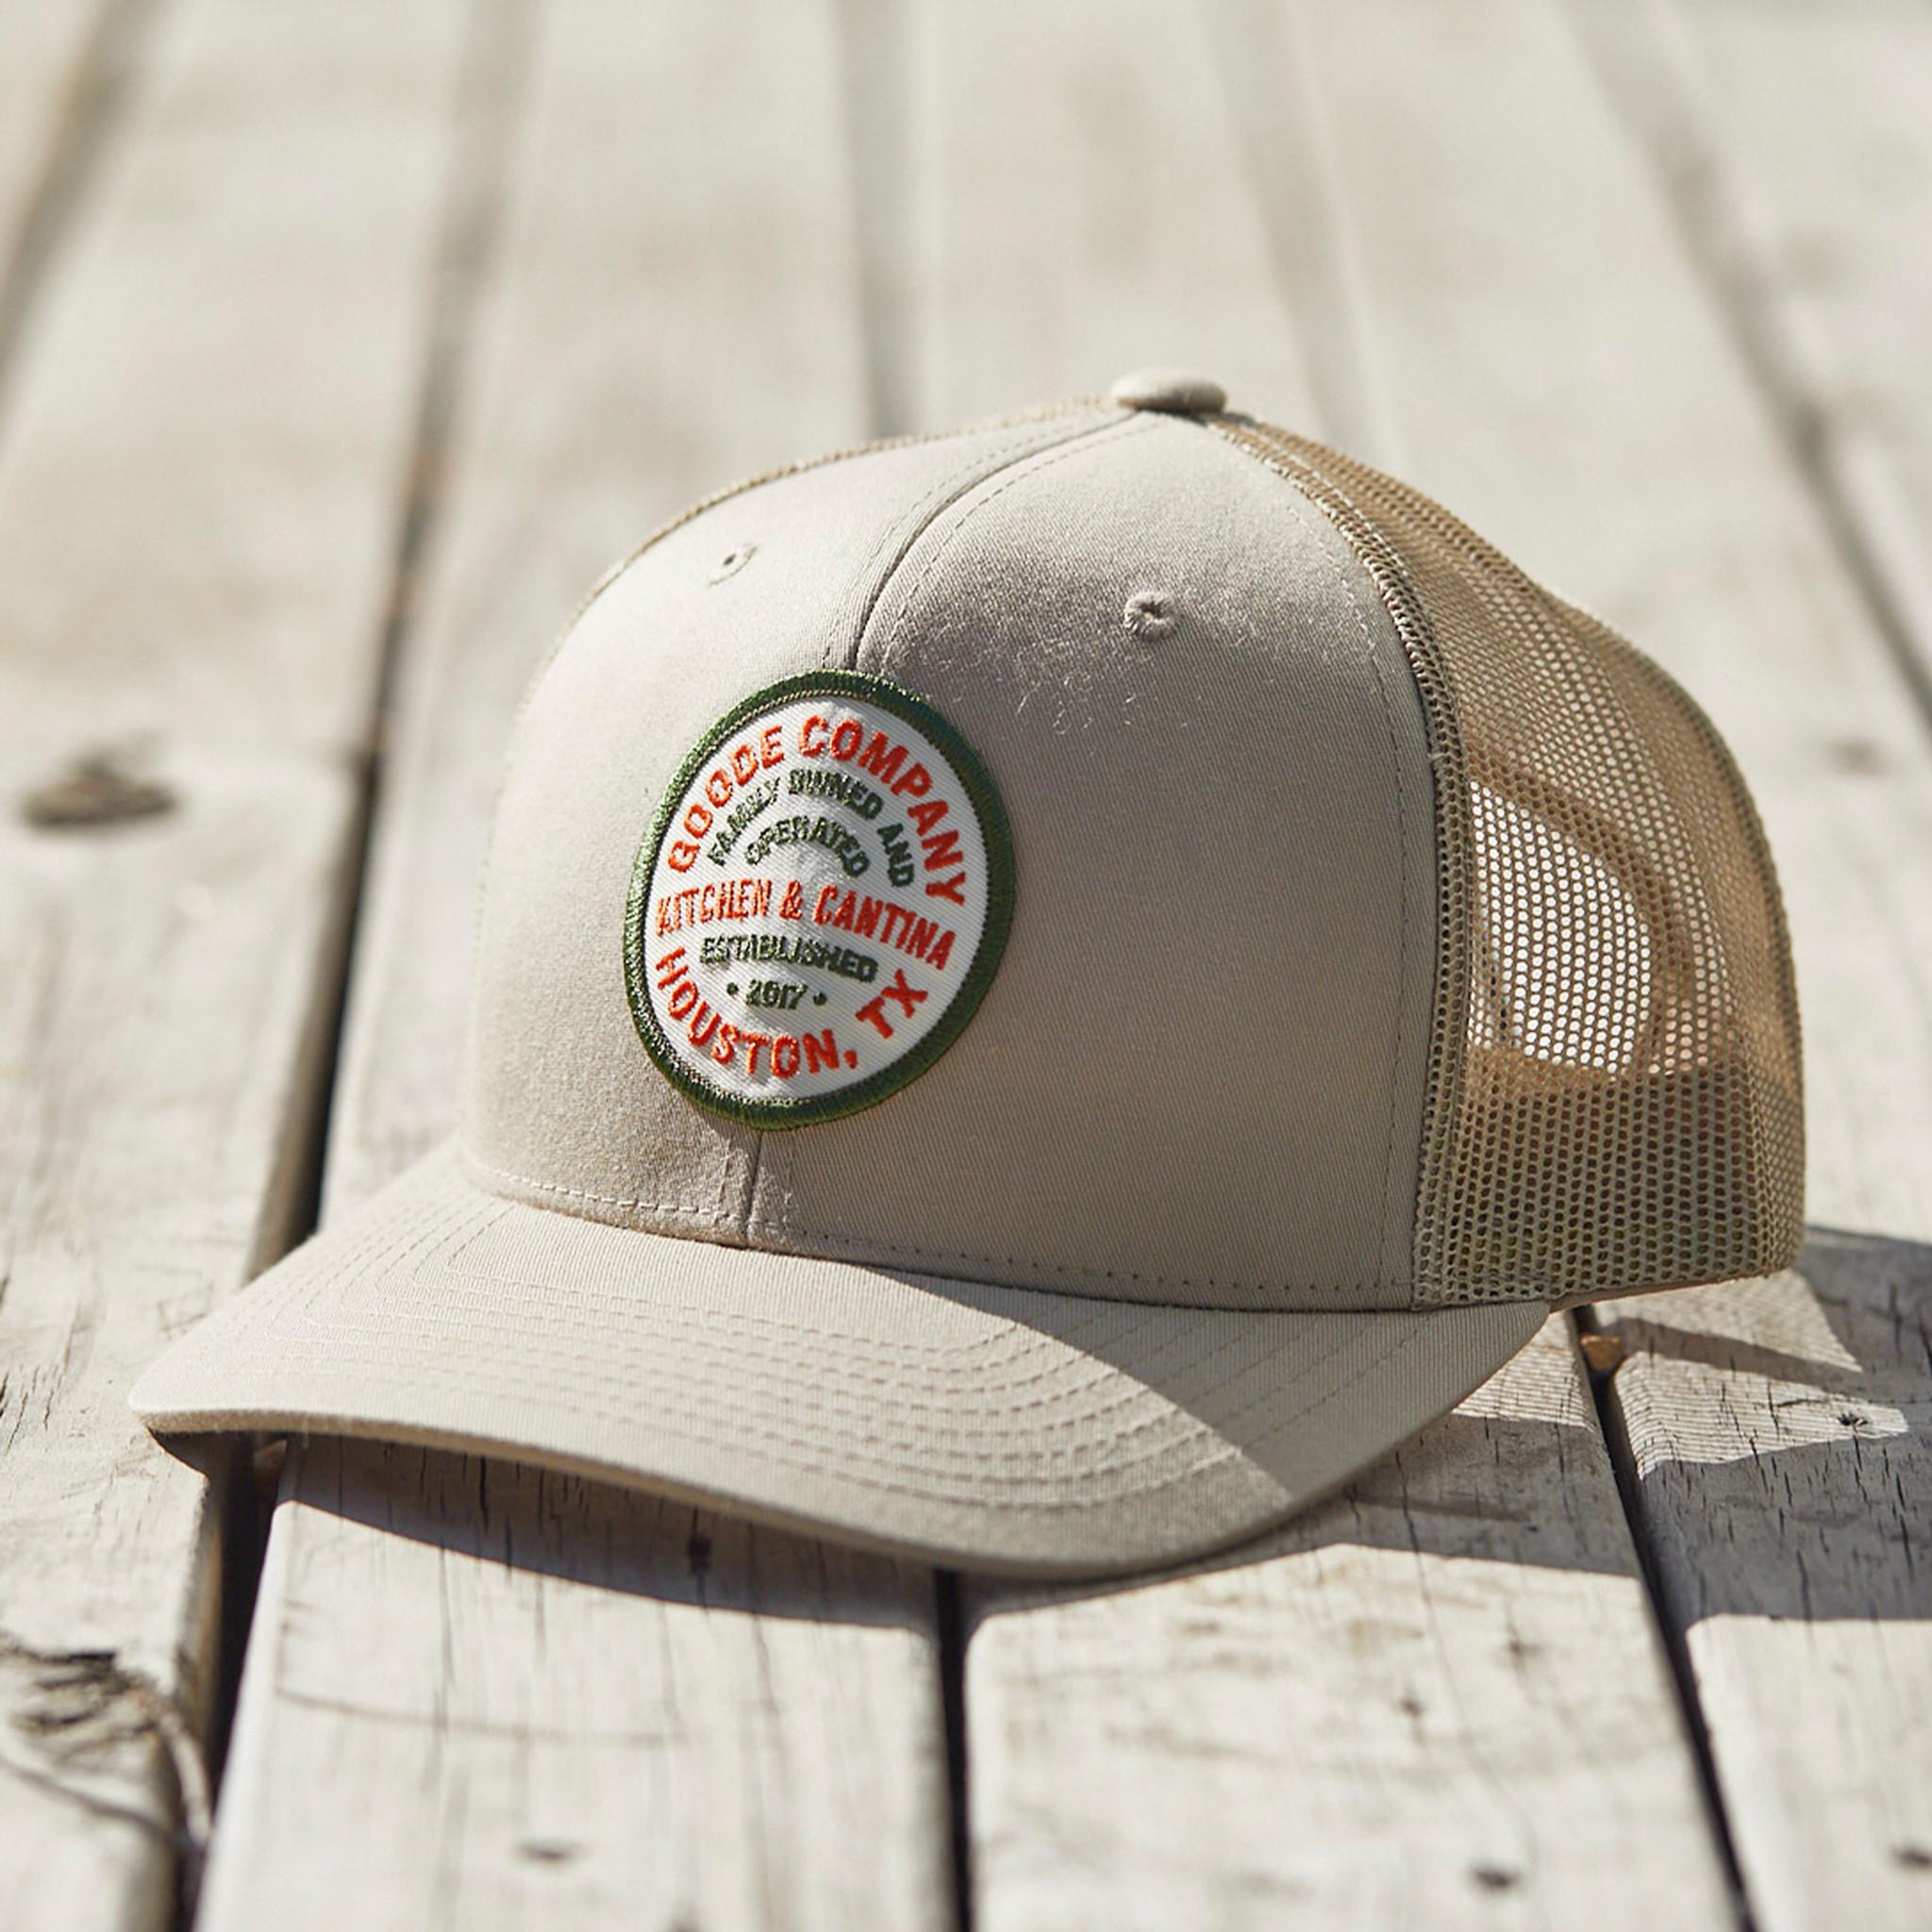 Goode Co Kitchen & Cantina Emblem Hat